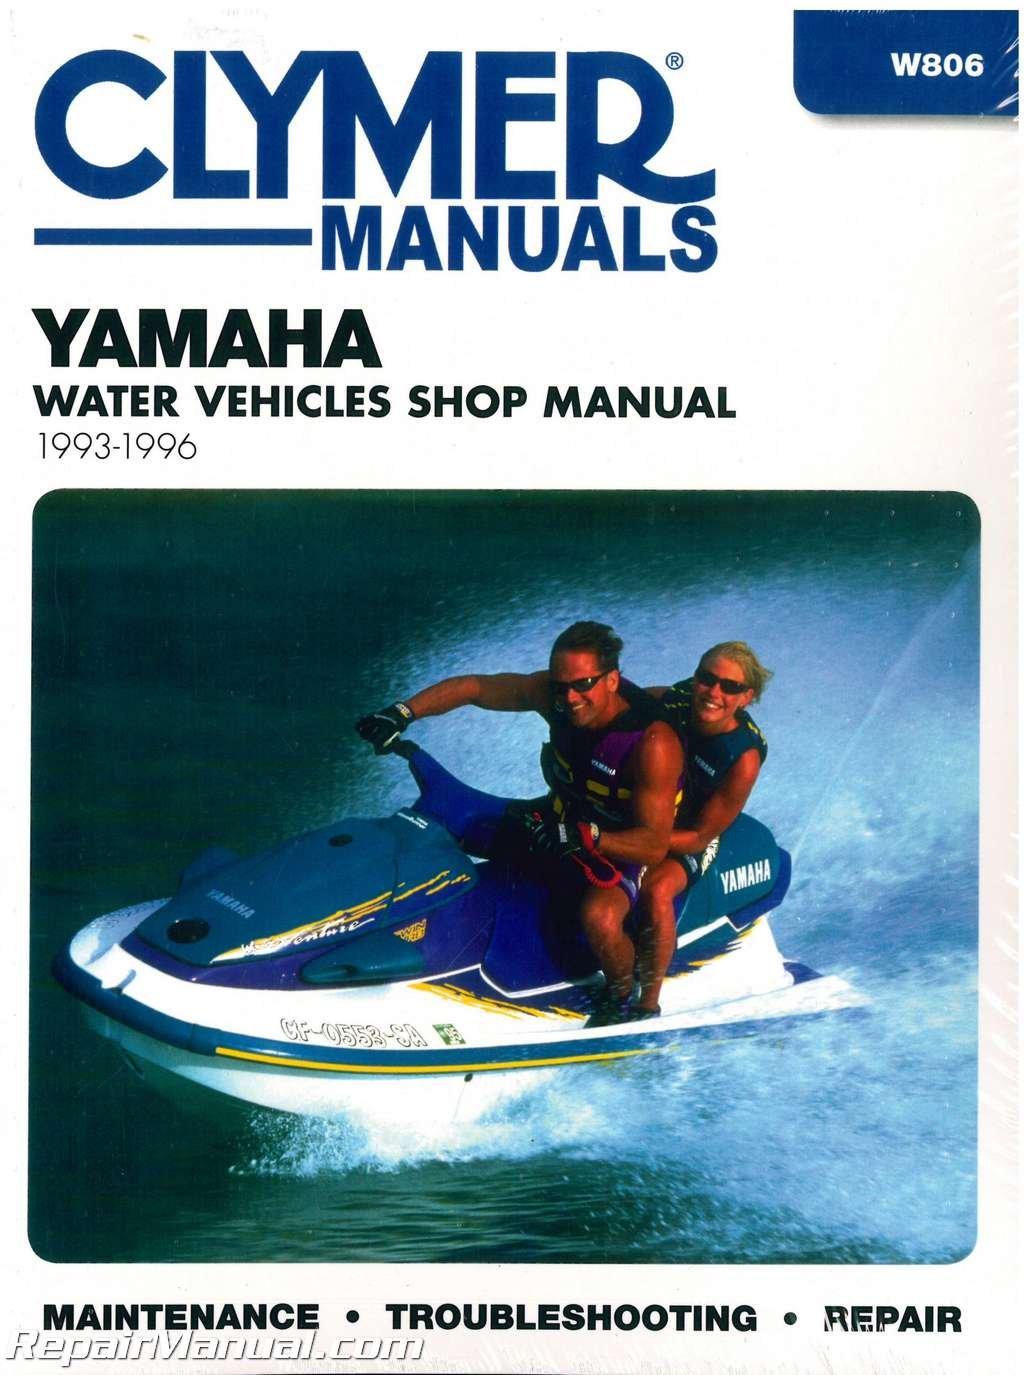 W806 1993-1996 Yamaha Waverunner Clymer Personal Watercraft Service Manual:  Manufacturer: Amazon.com: Books